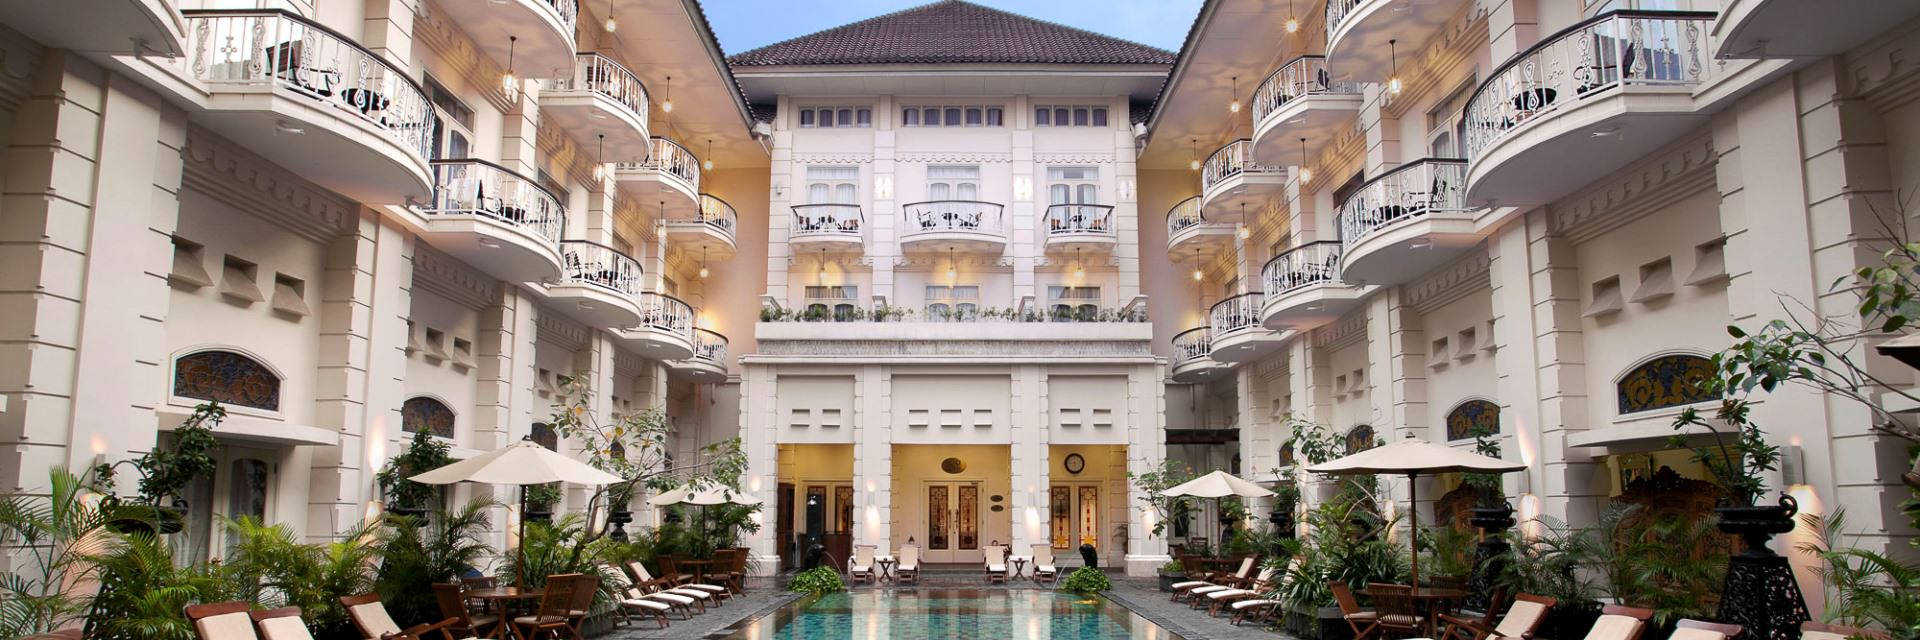 The Phoenix Hotel ala Bangsawan Eropa di Yogyakarta The Phoenix Hotel ala Bangsawan Eropa di Yogyakarta - Dolan Dolen